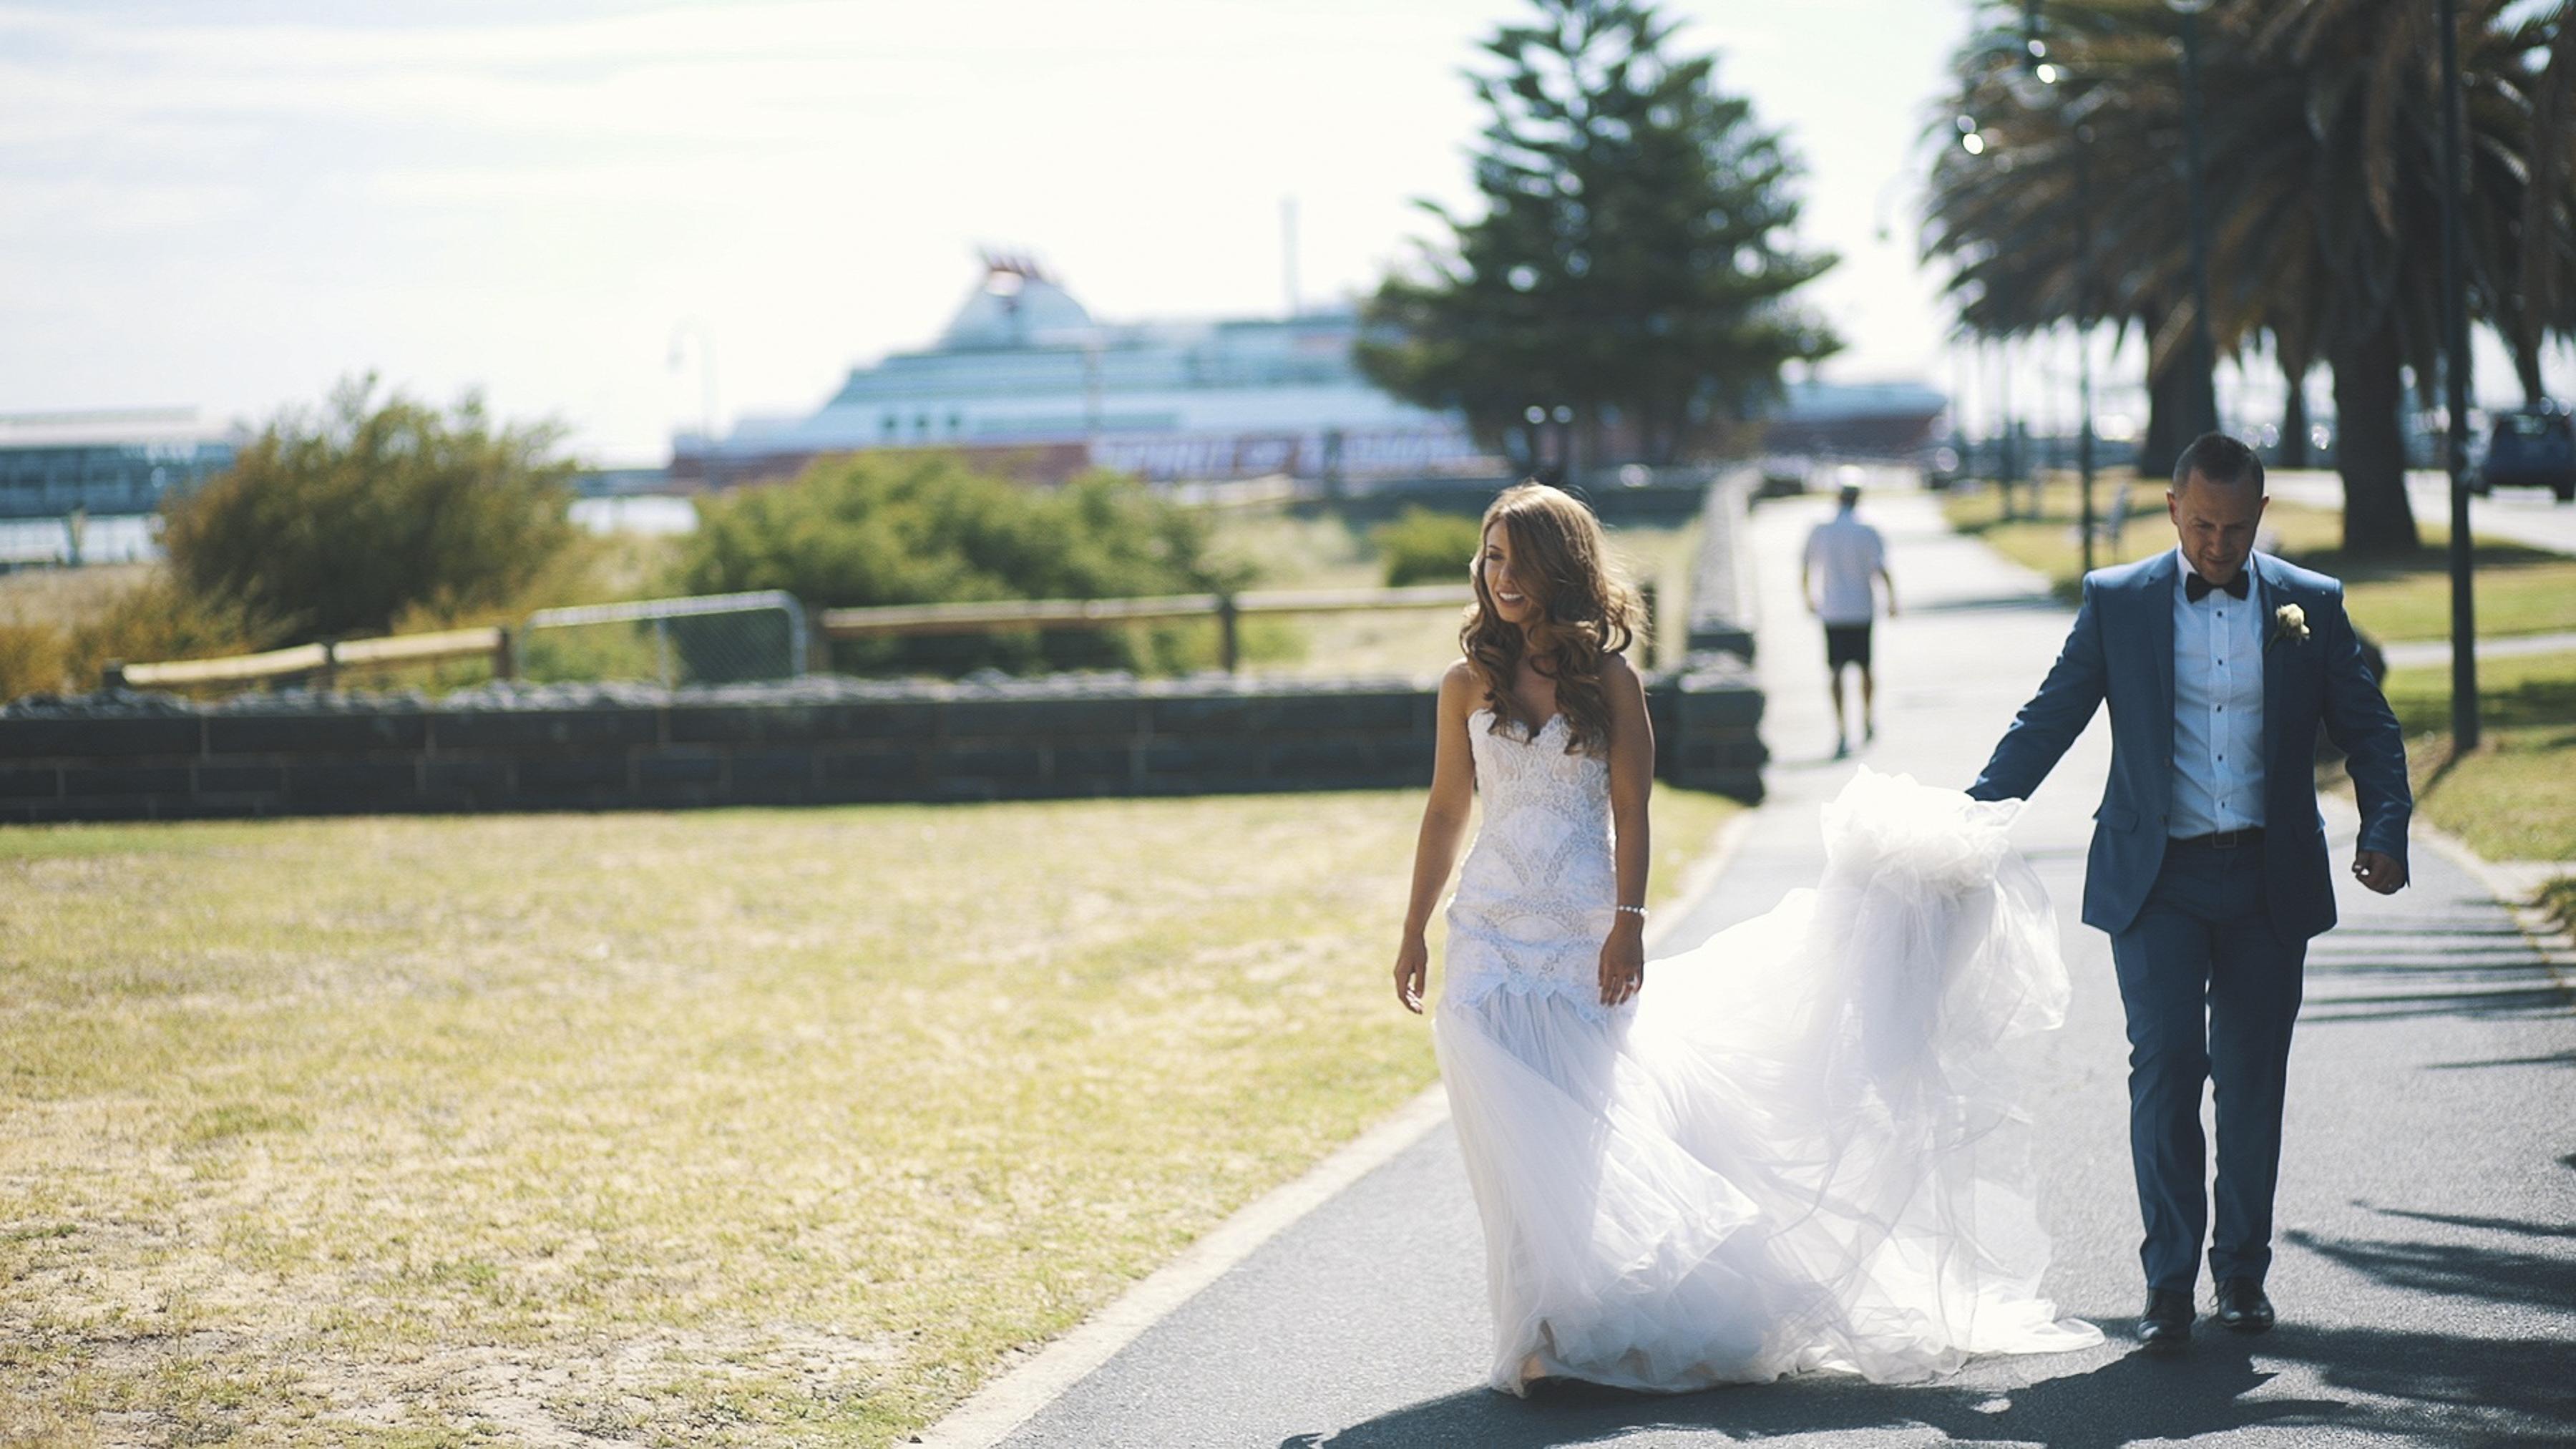 https://sleeklens.com/wp-content/uploads/2018/09/wedding-lightroom-presets-signature-bride-groom-before-11.jpg